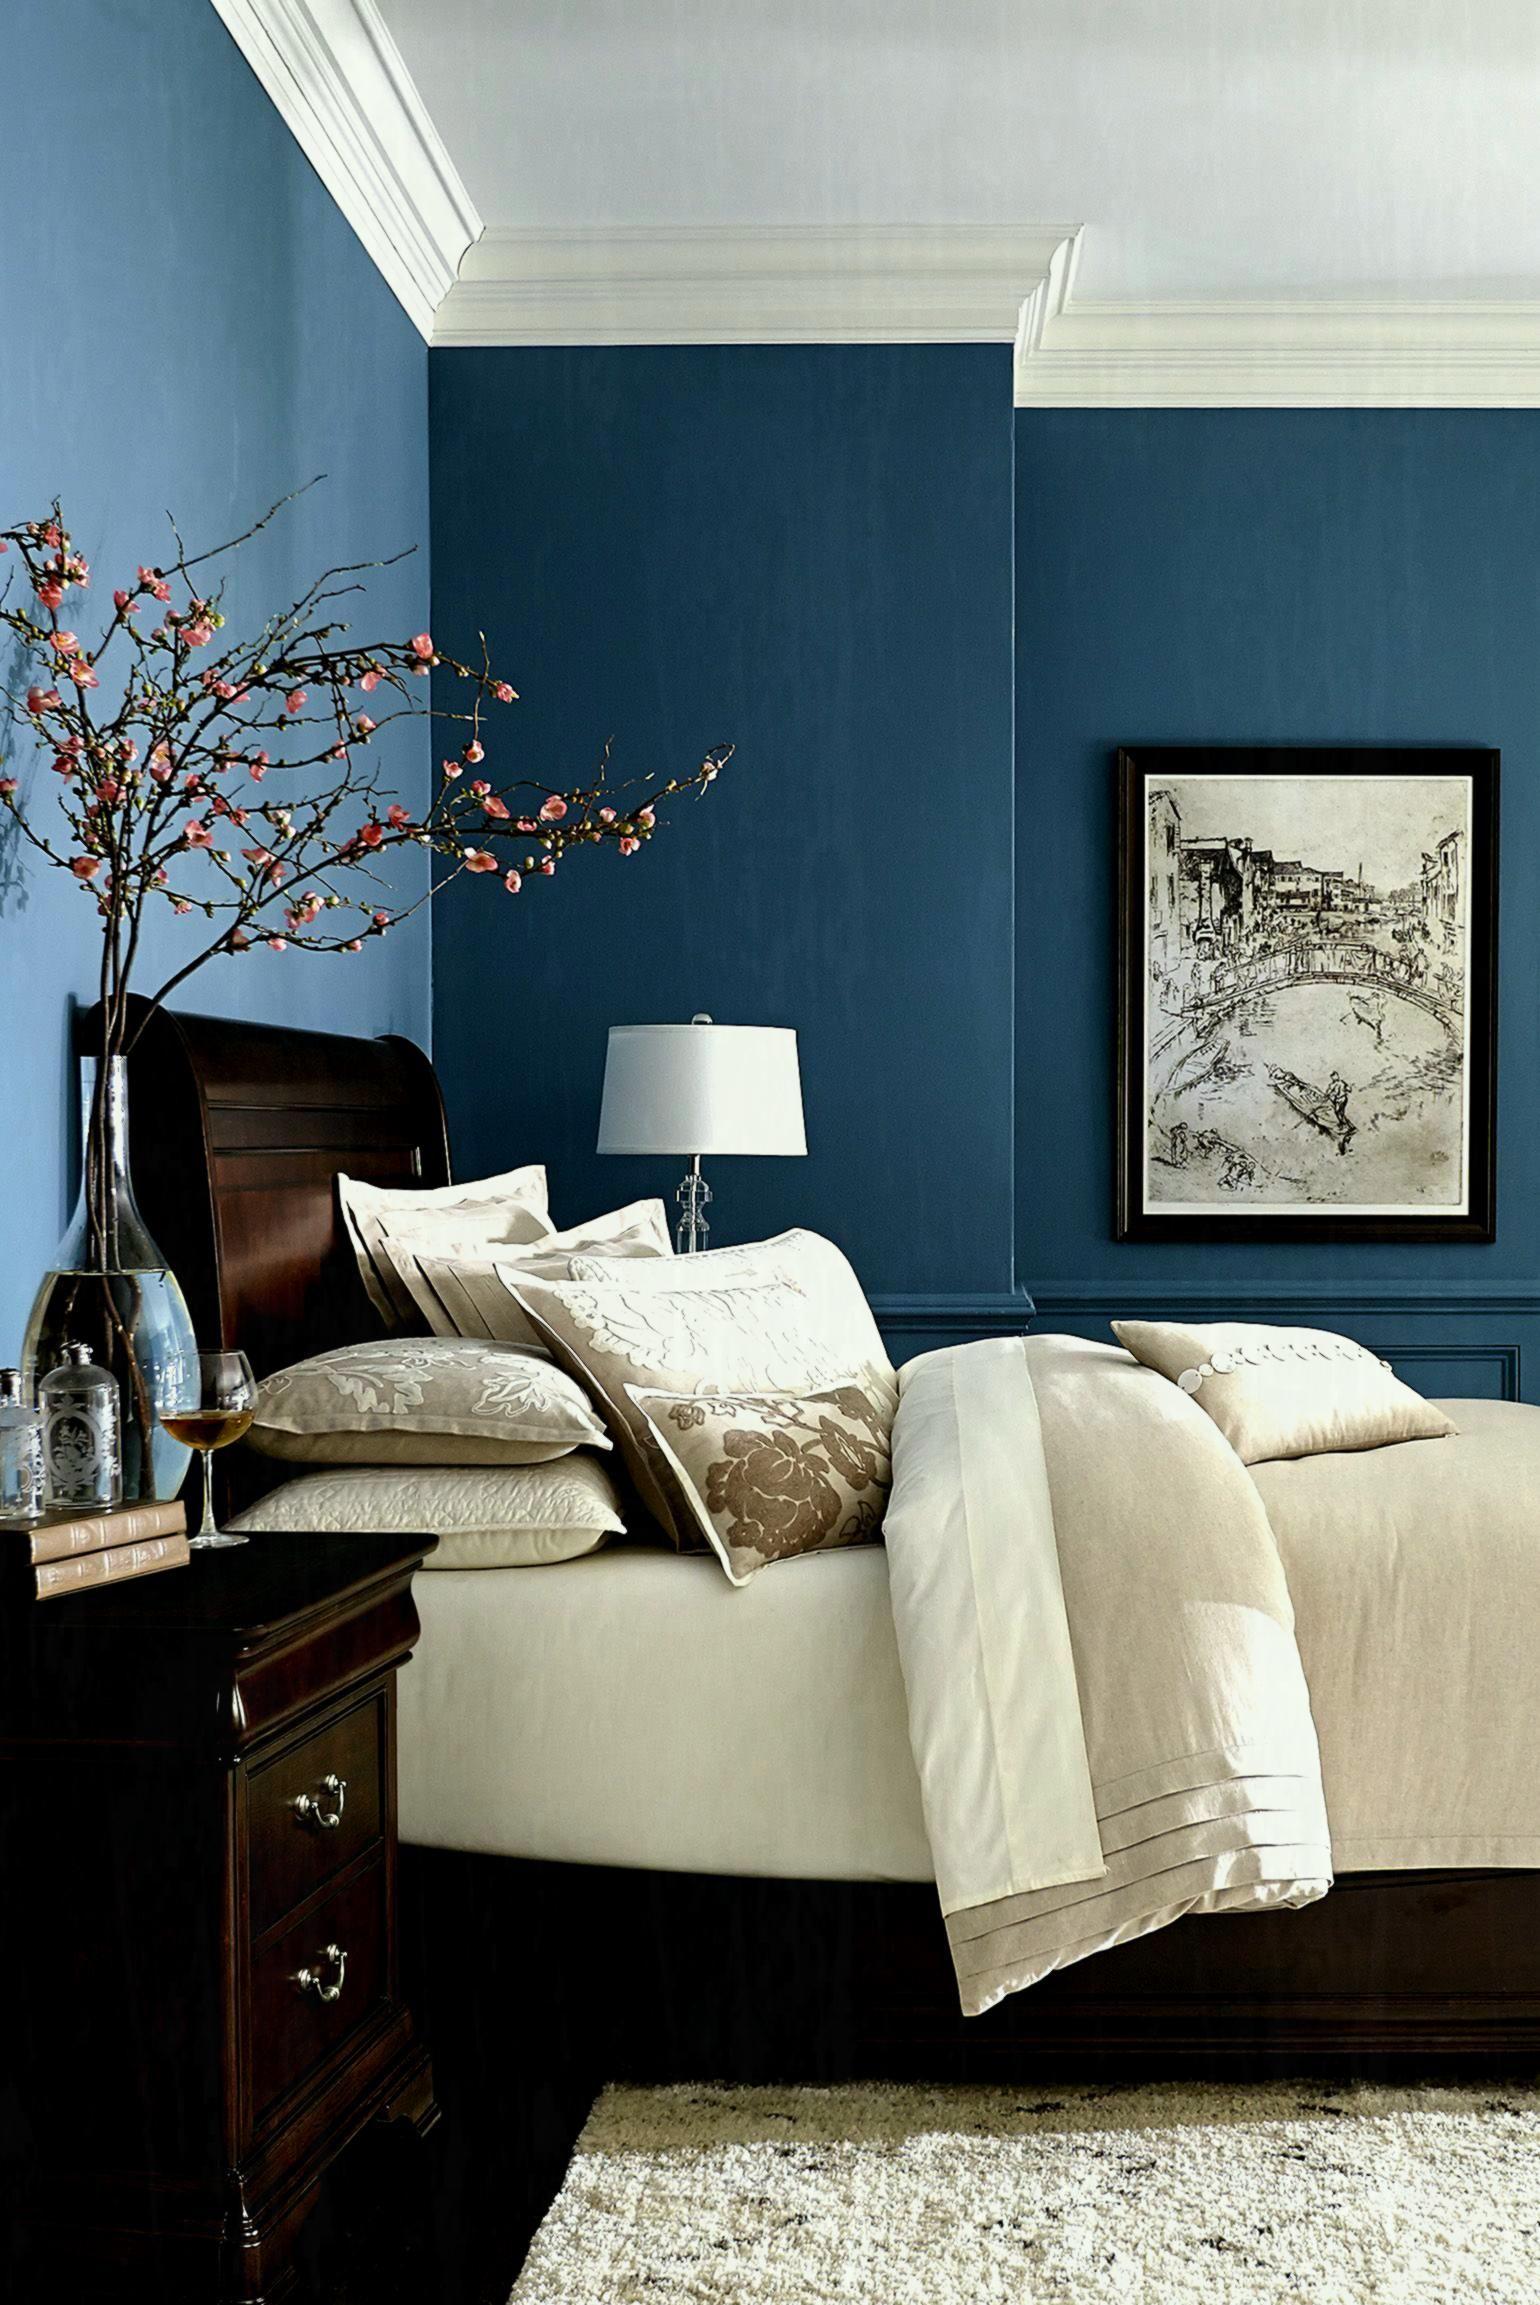 Bedroom Wall Color Schemes Interior Ideas On Design Zen Scheme